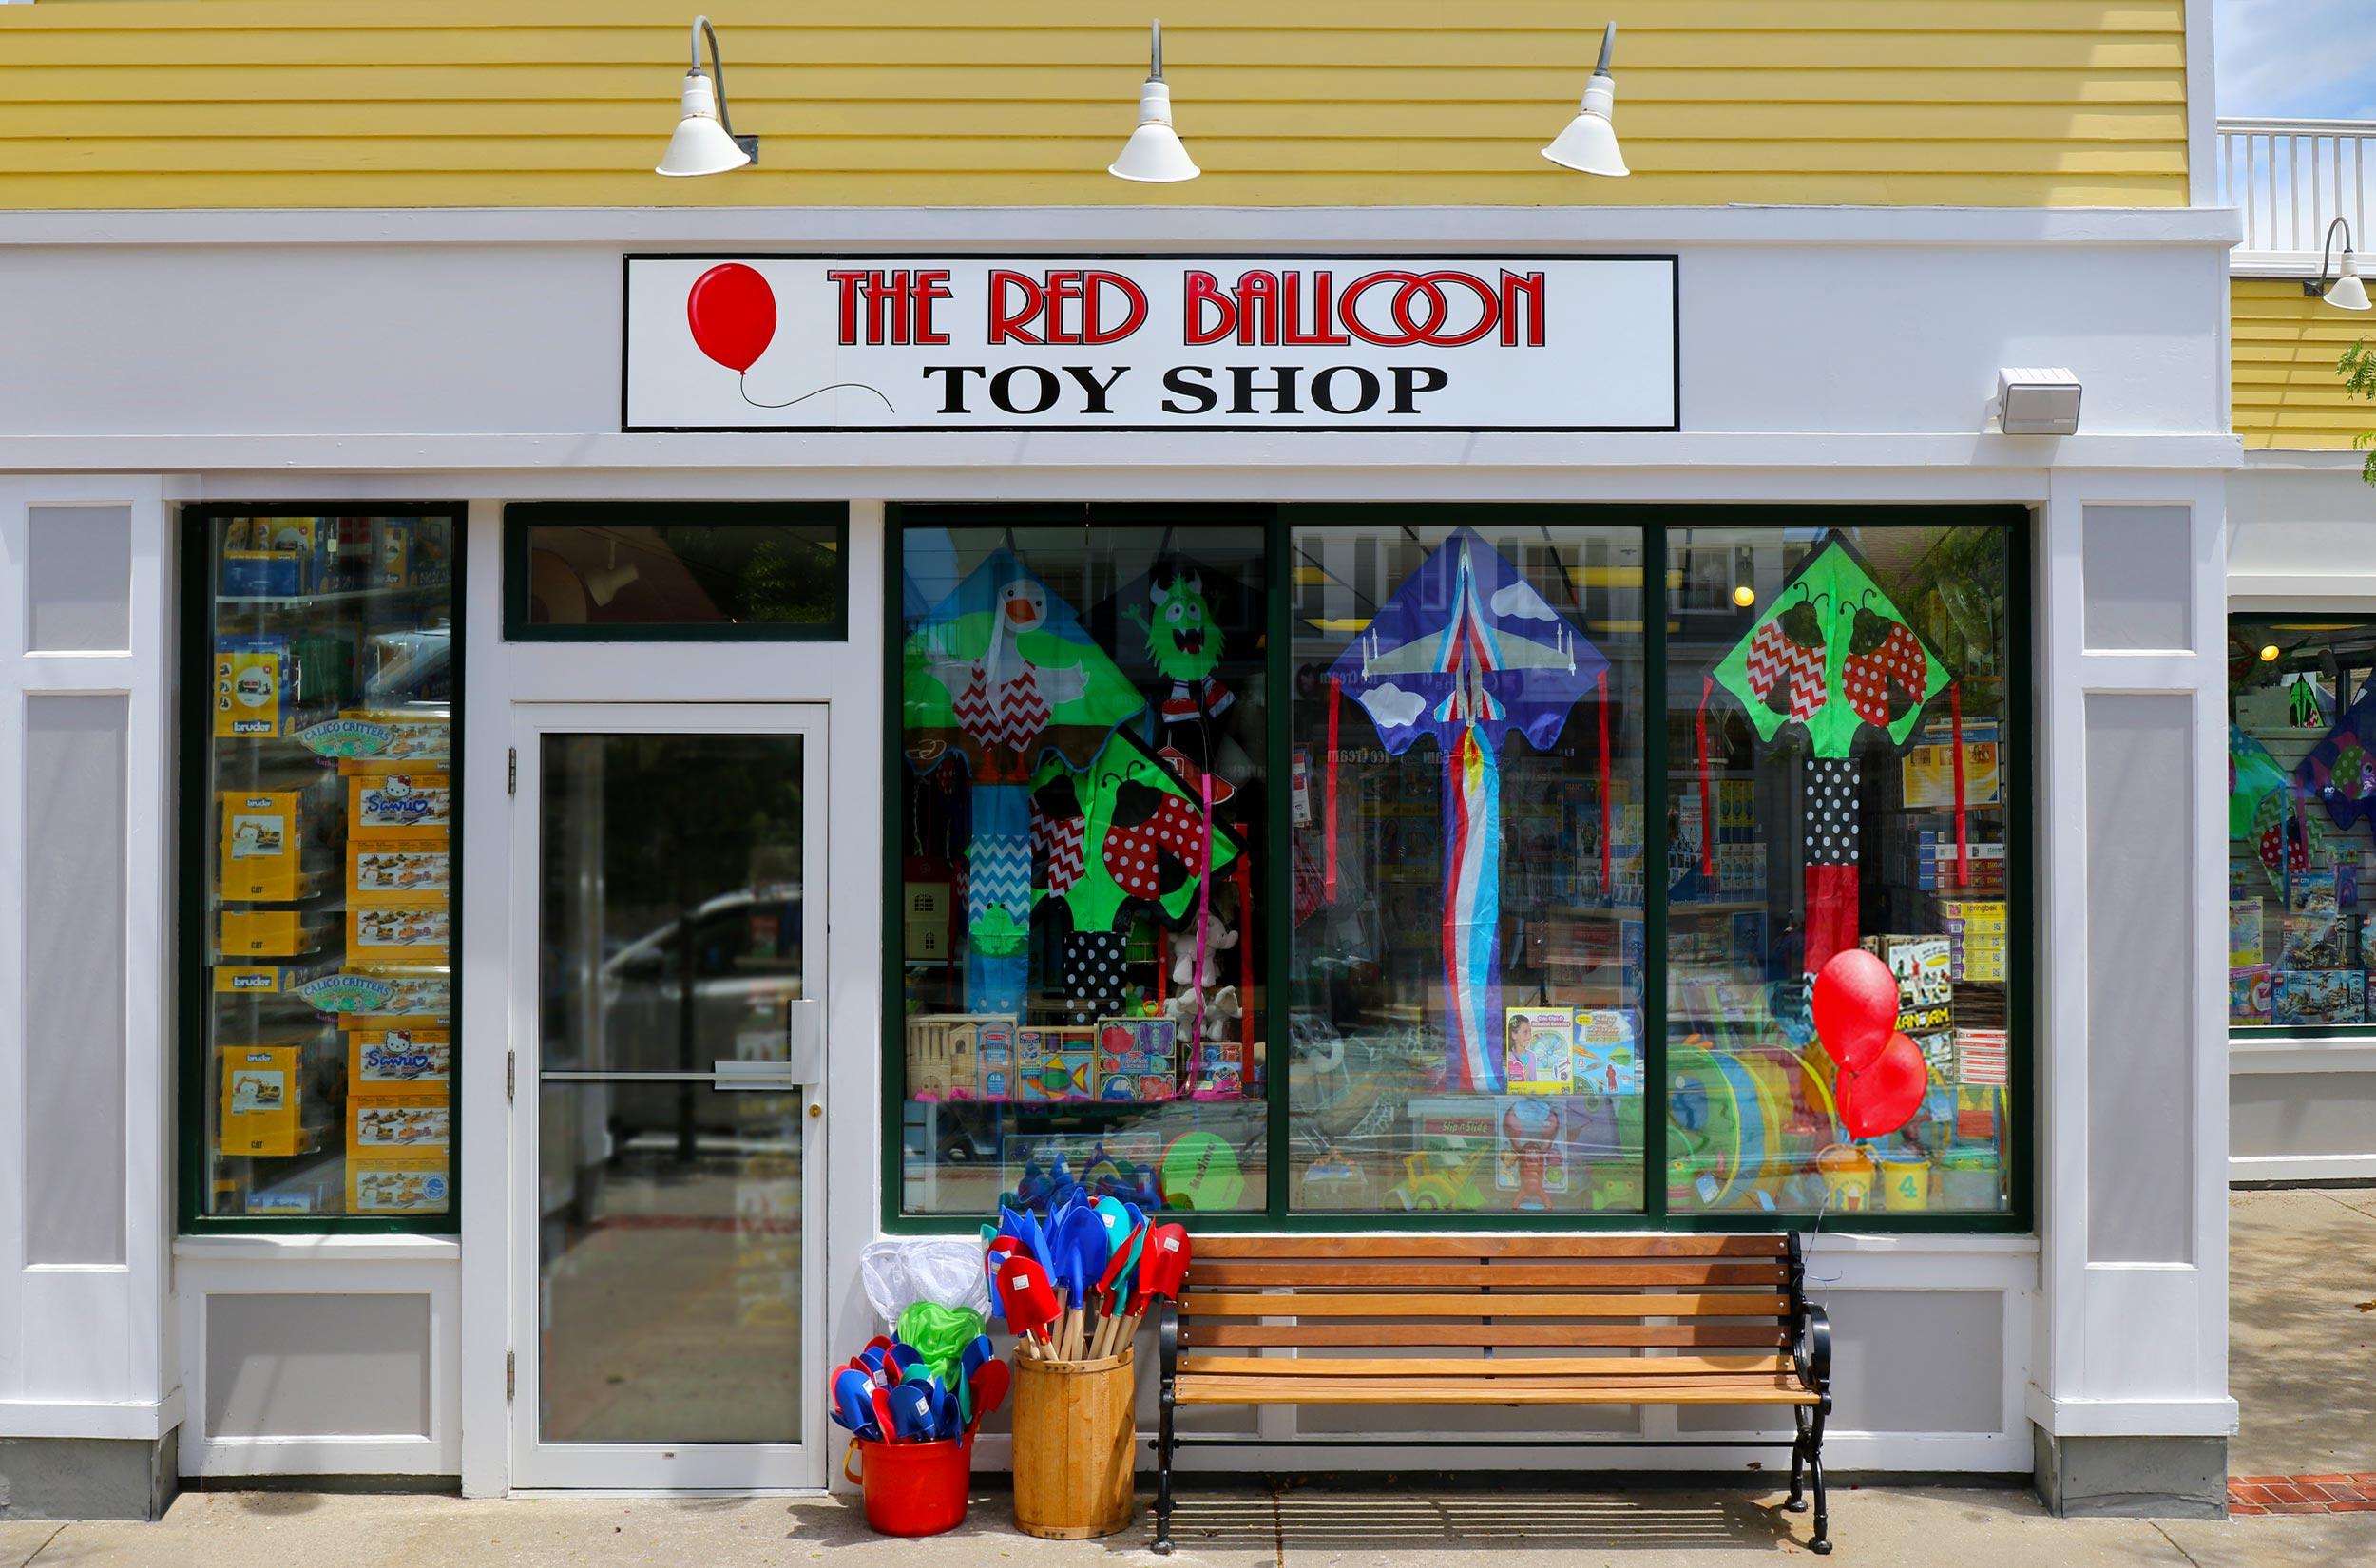 The-Red-Balloon-Toy-Shop-Mashpee-Cape-Cod.jpg